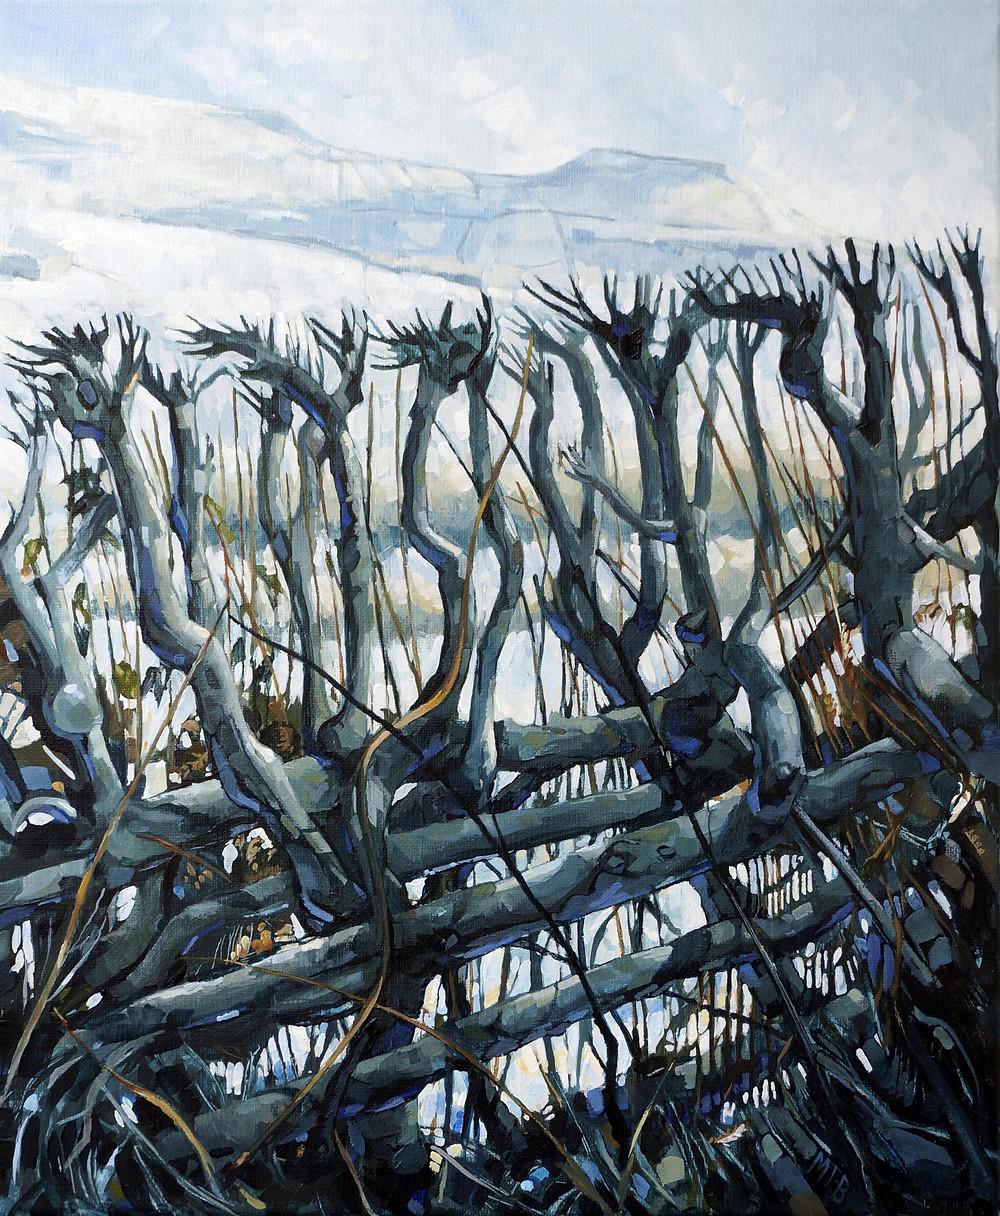 Winter Hedgerow, acrylic on linen canvas.